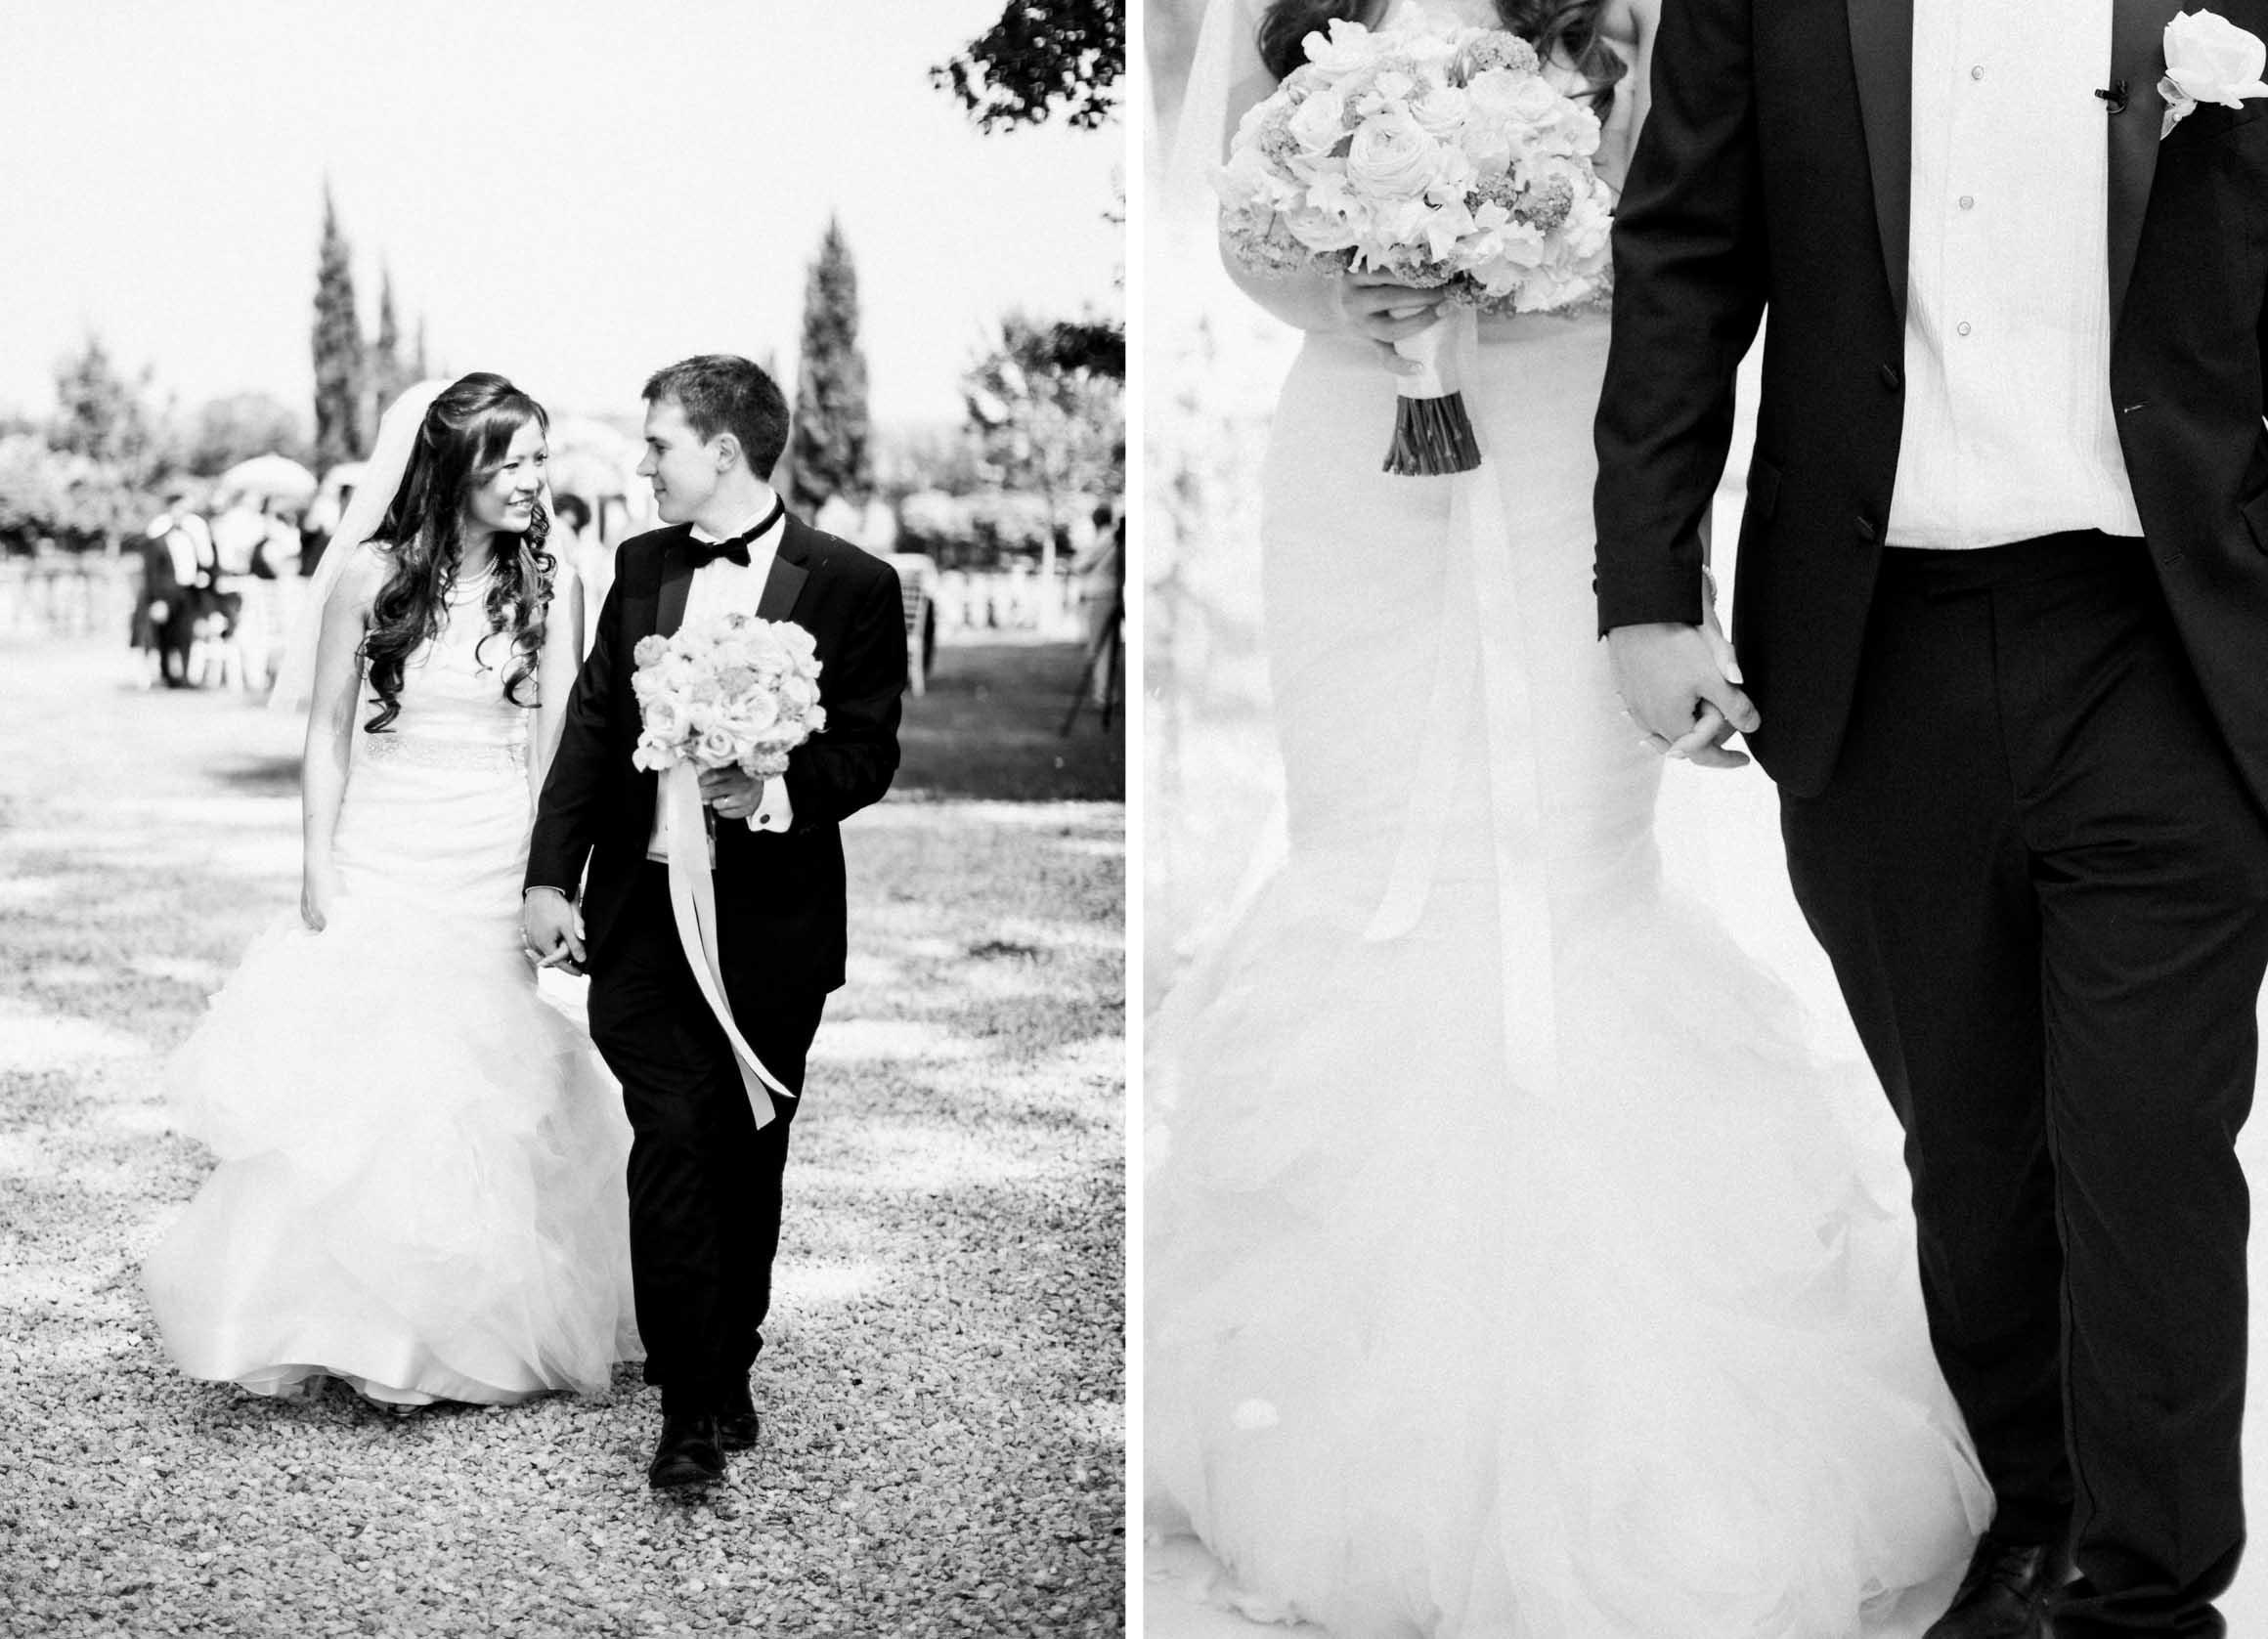 Amy O'Boyle Photography- Destination & UK Fine Art Film Wedding Photographer- Chateau La Durantie Wedding 11.jpg